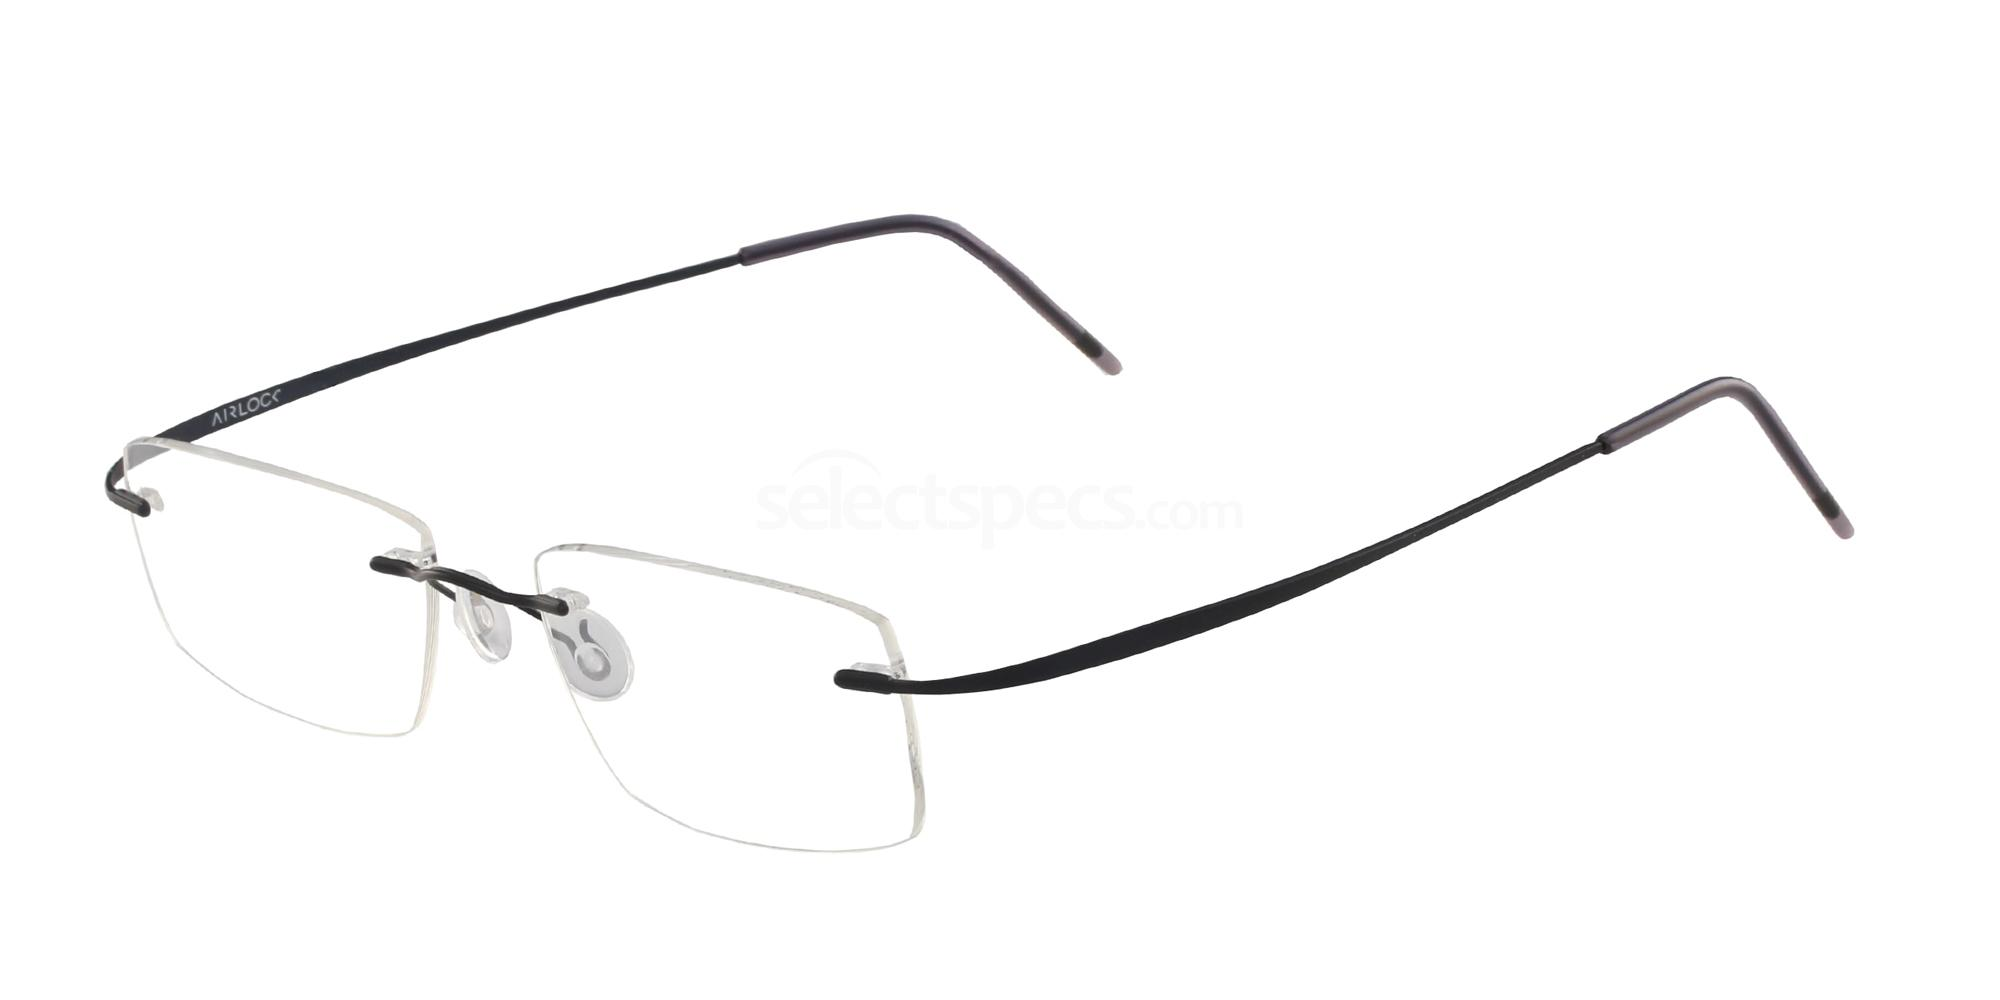 412 ELEMENT 202 Glasses, AIRLOCK